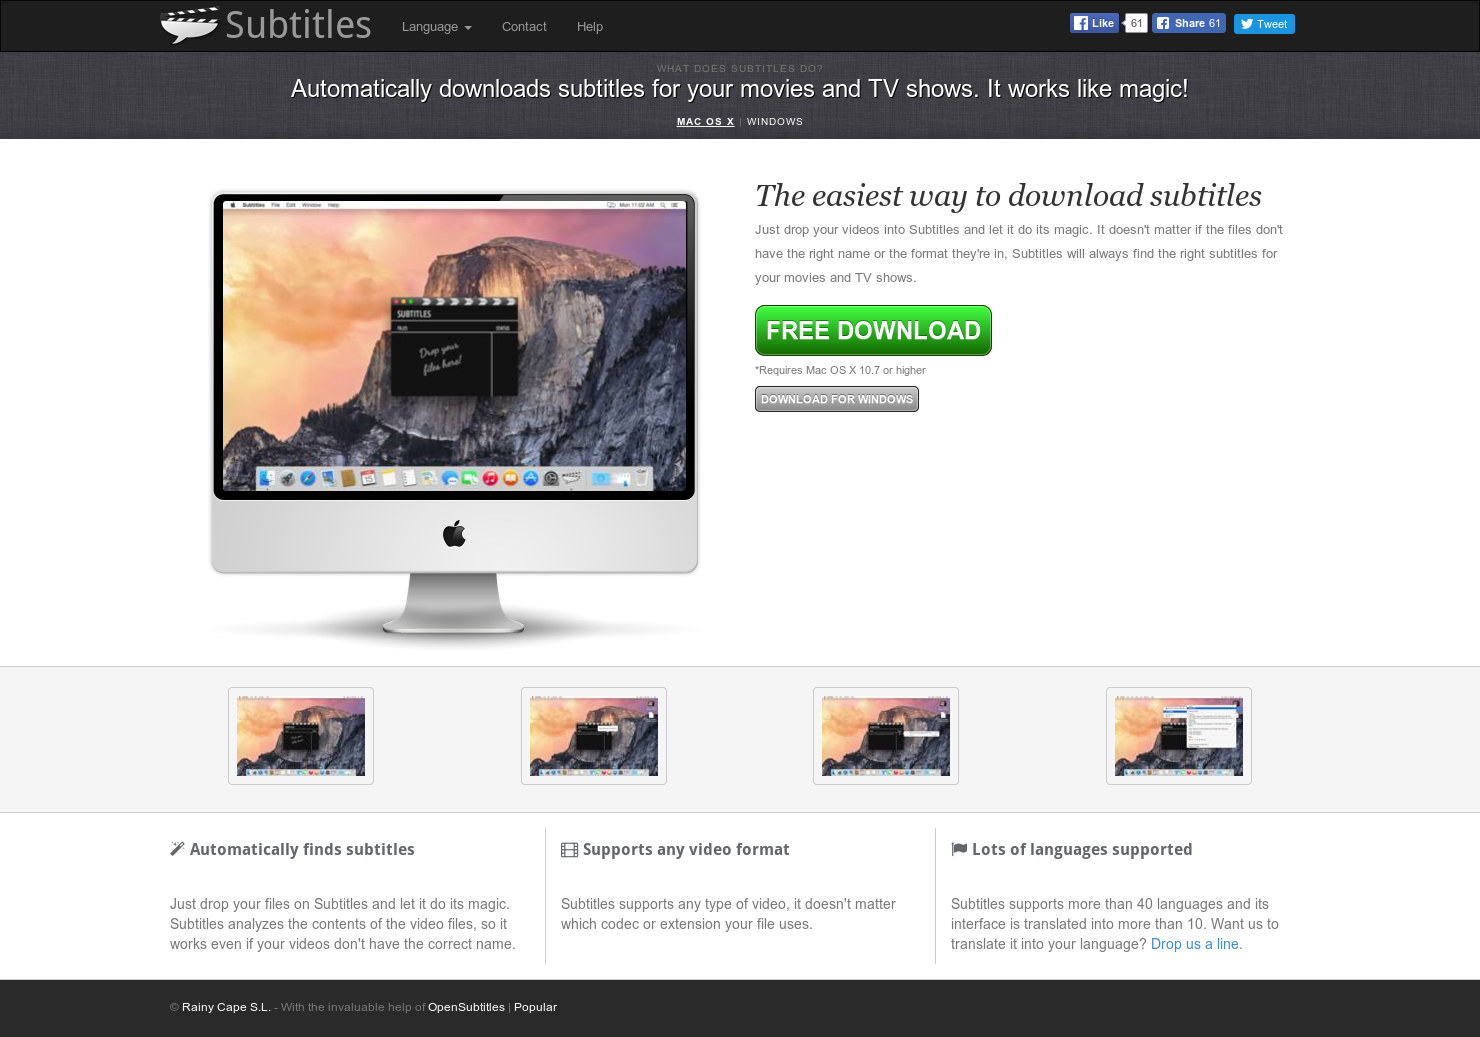 Subtitles - Auto-download subtitles for movie files